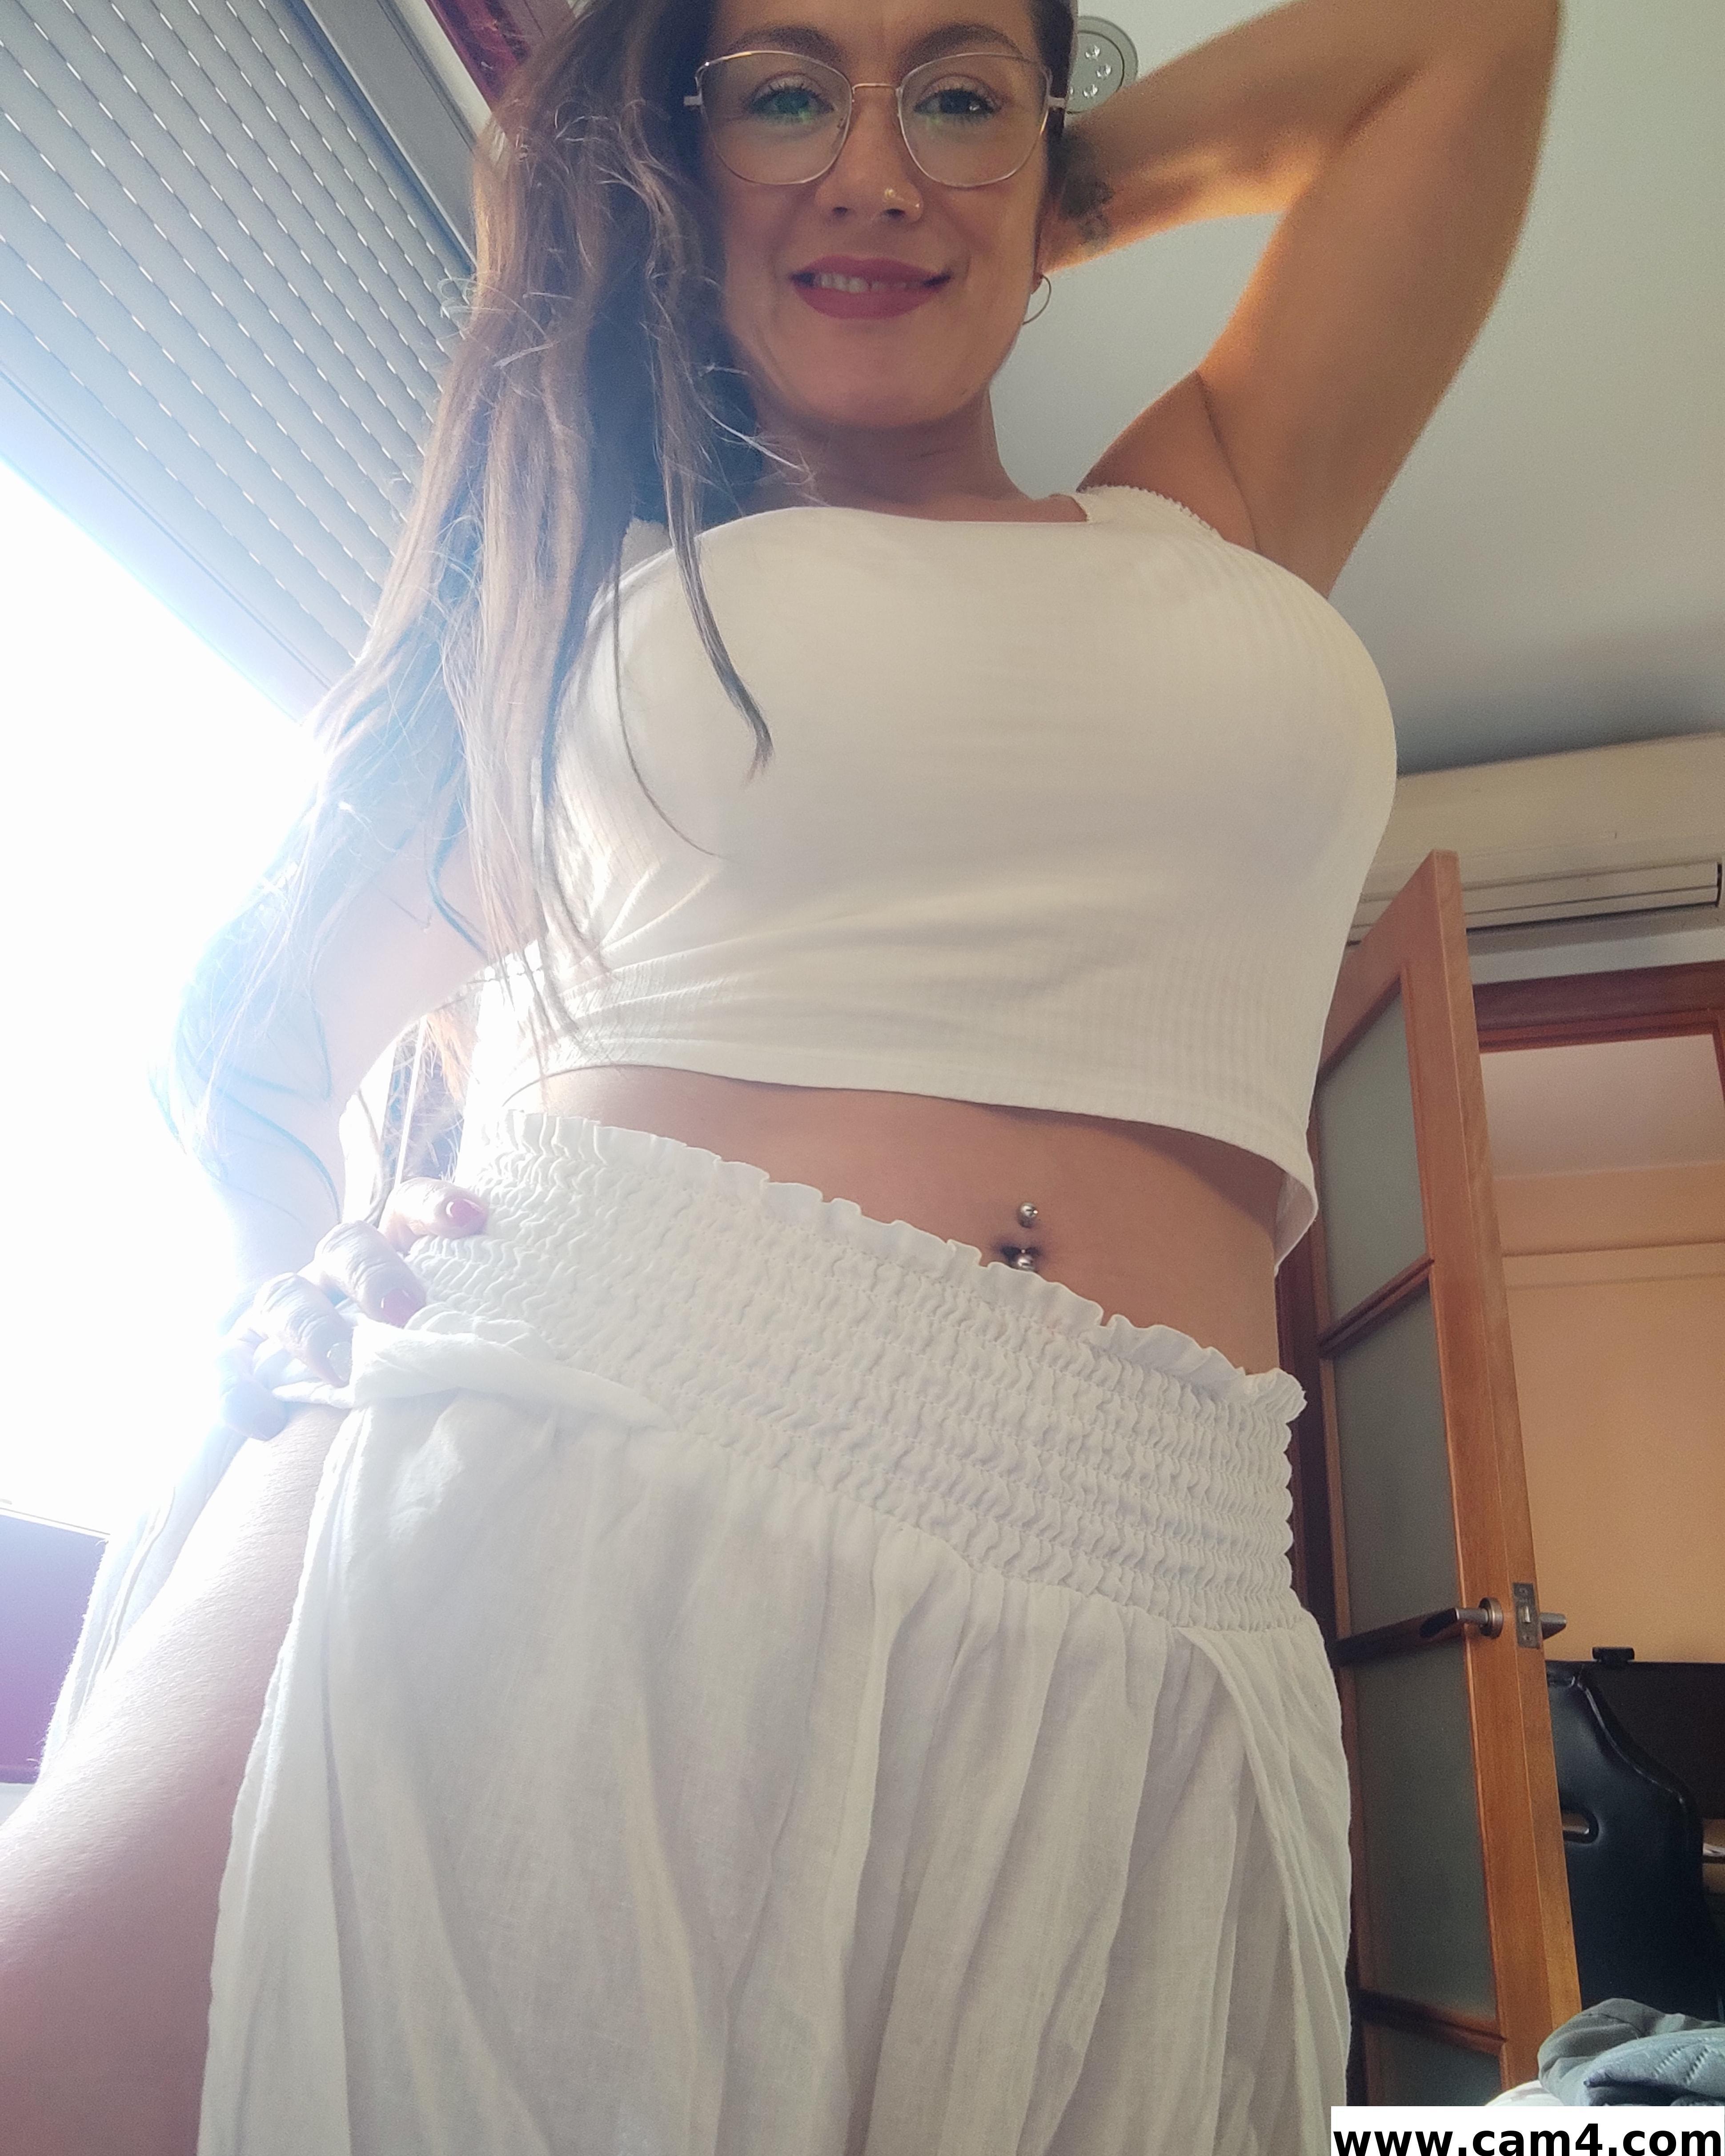 Angelita81?s=kdvlustoag540ivex1ete6c1npxne7oxfnkvkv97+q0=